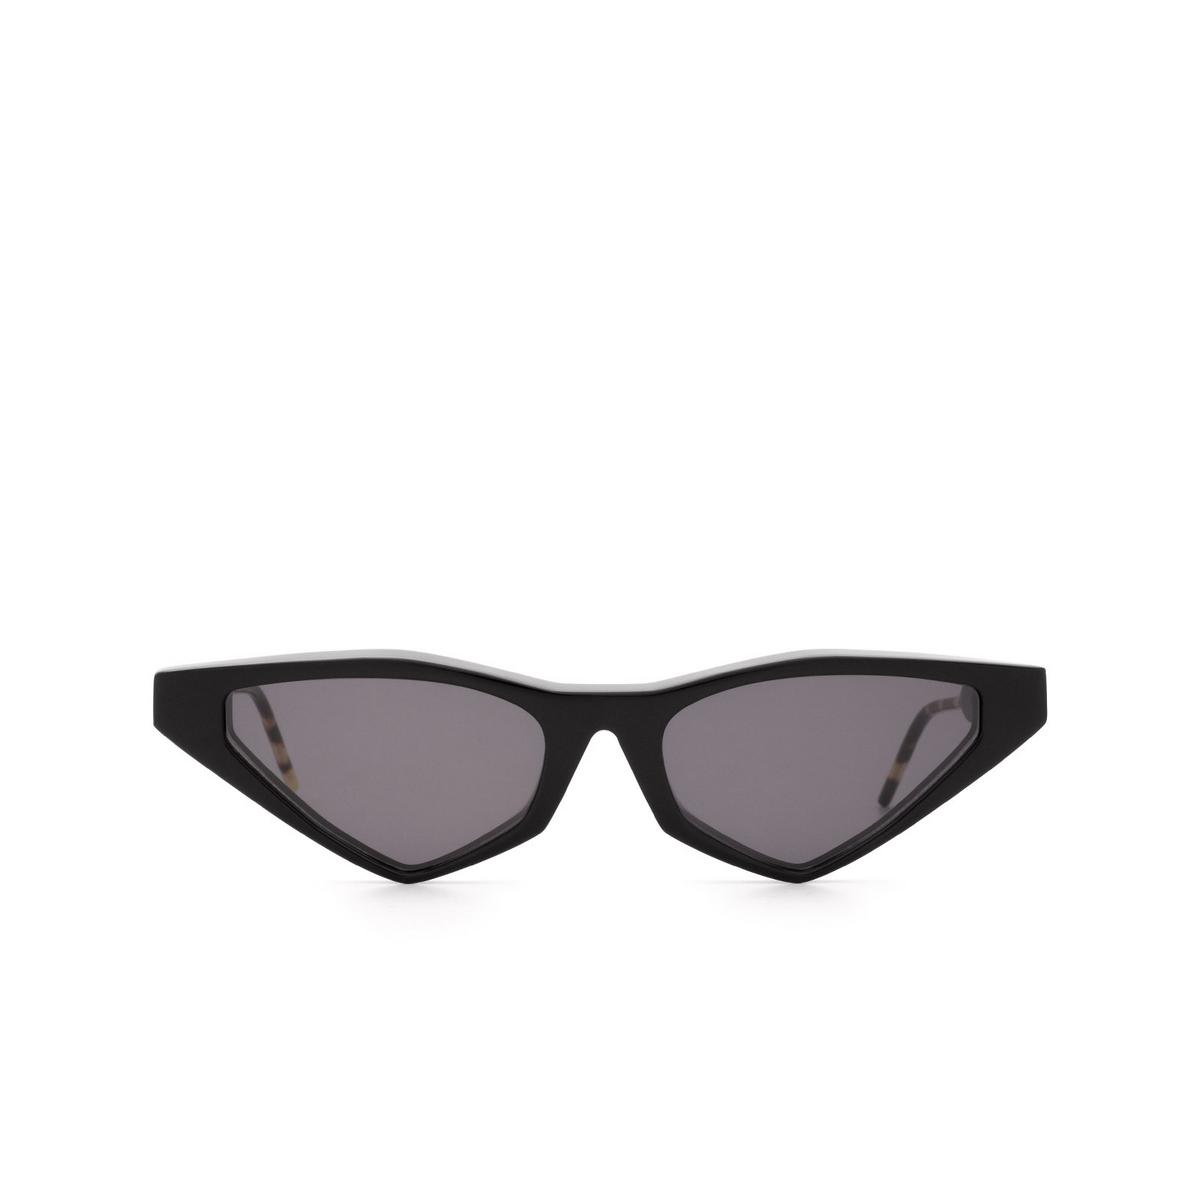 Soya® Cat-eye Sunglasses: Ann color Shiny Black Blk-fs - front view.